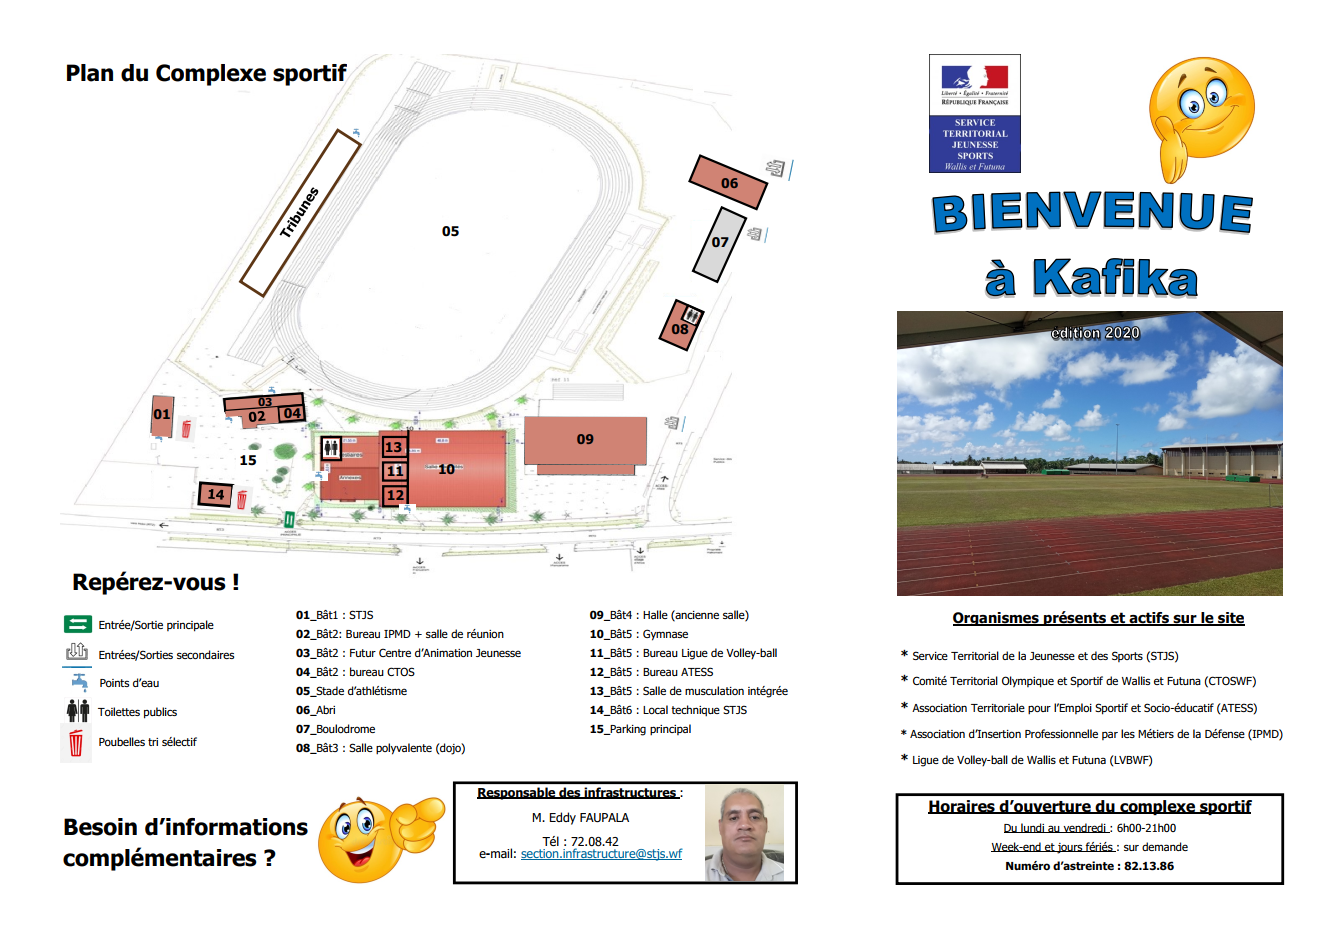 Plan du complexe sprtif de Kafika